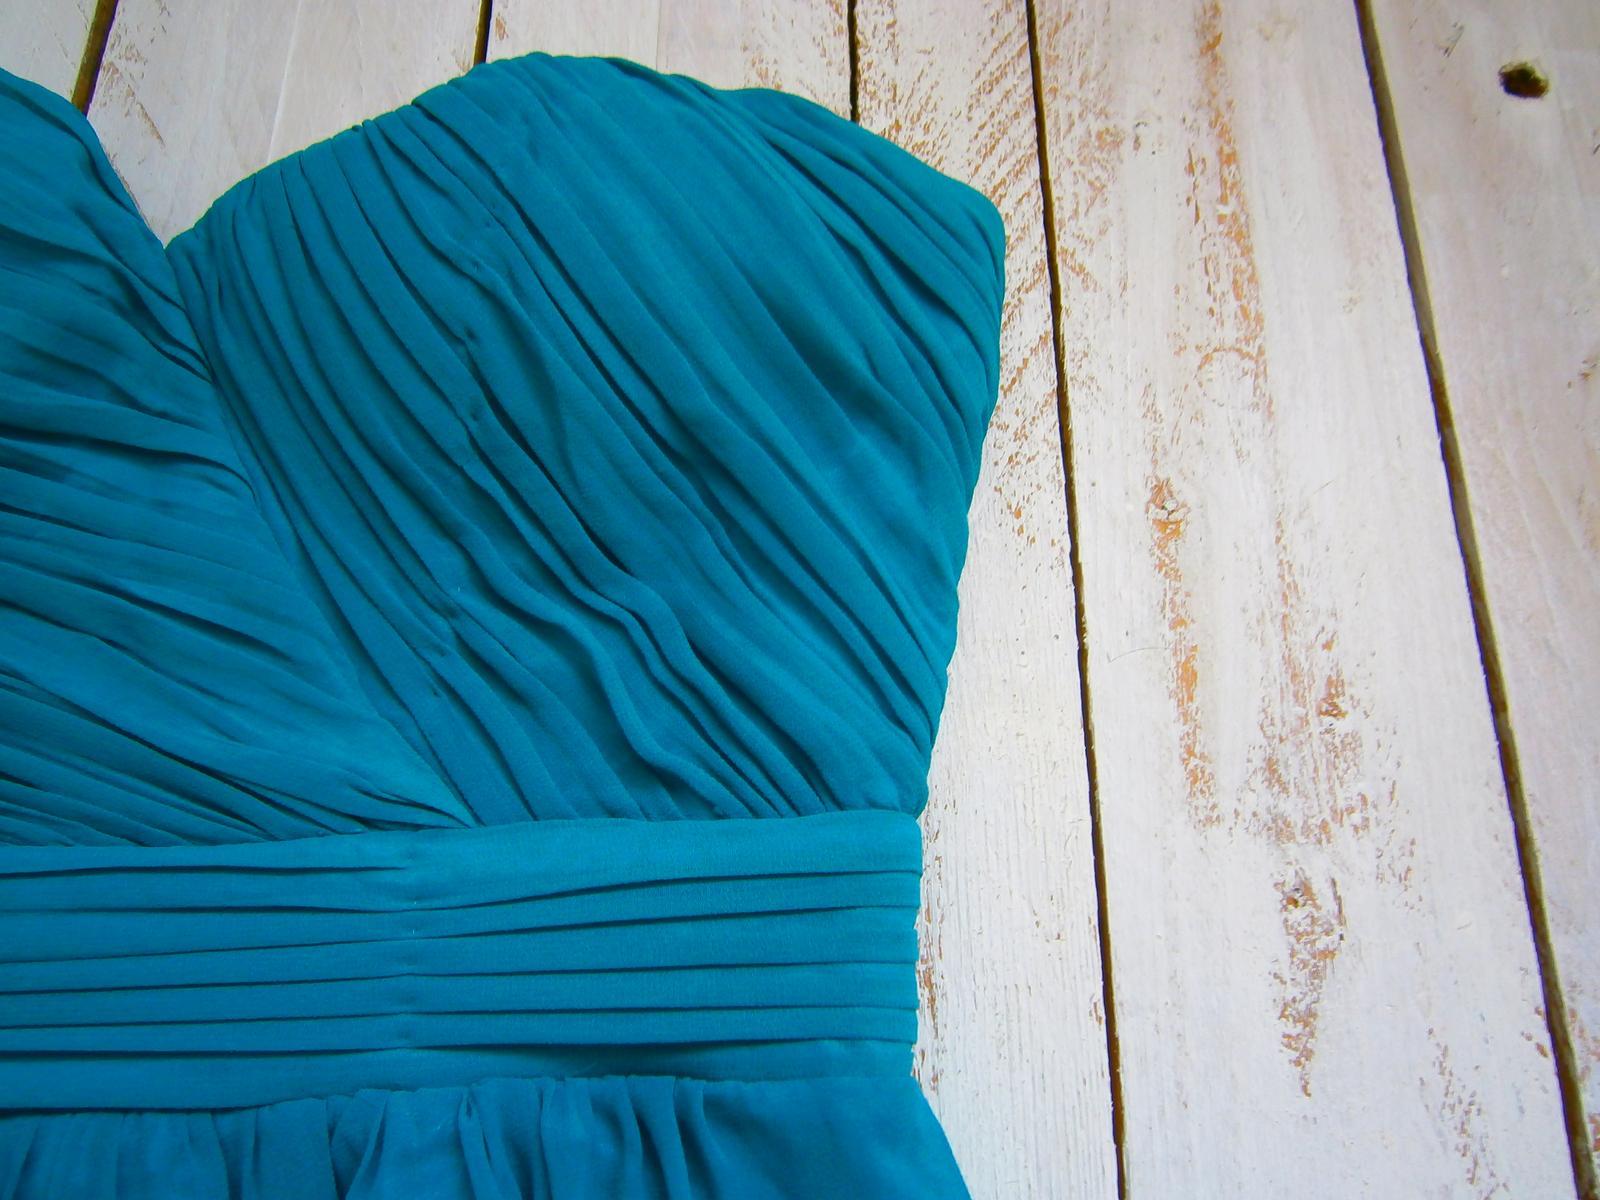 Dlhé spoločenské šaty jane norman xs s  45f6e84bbc2